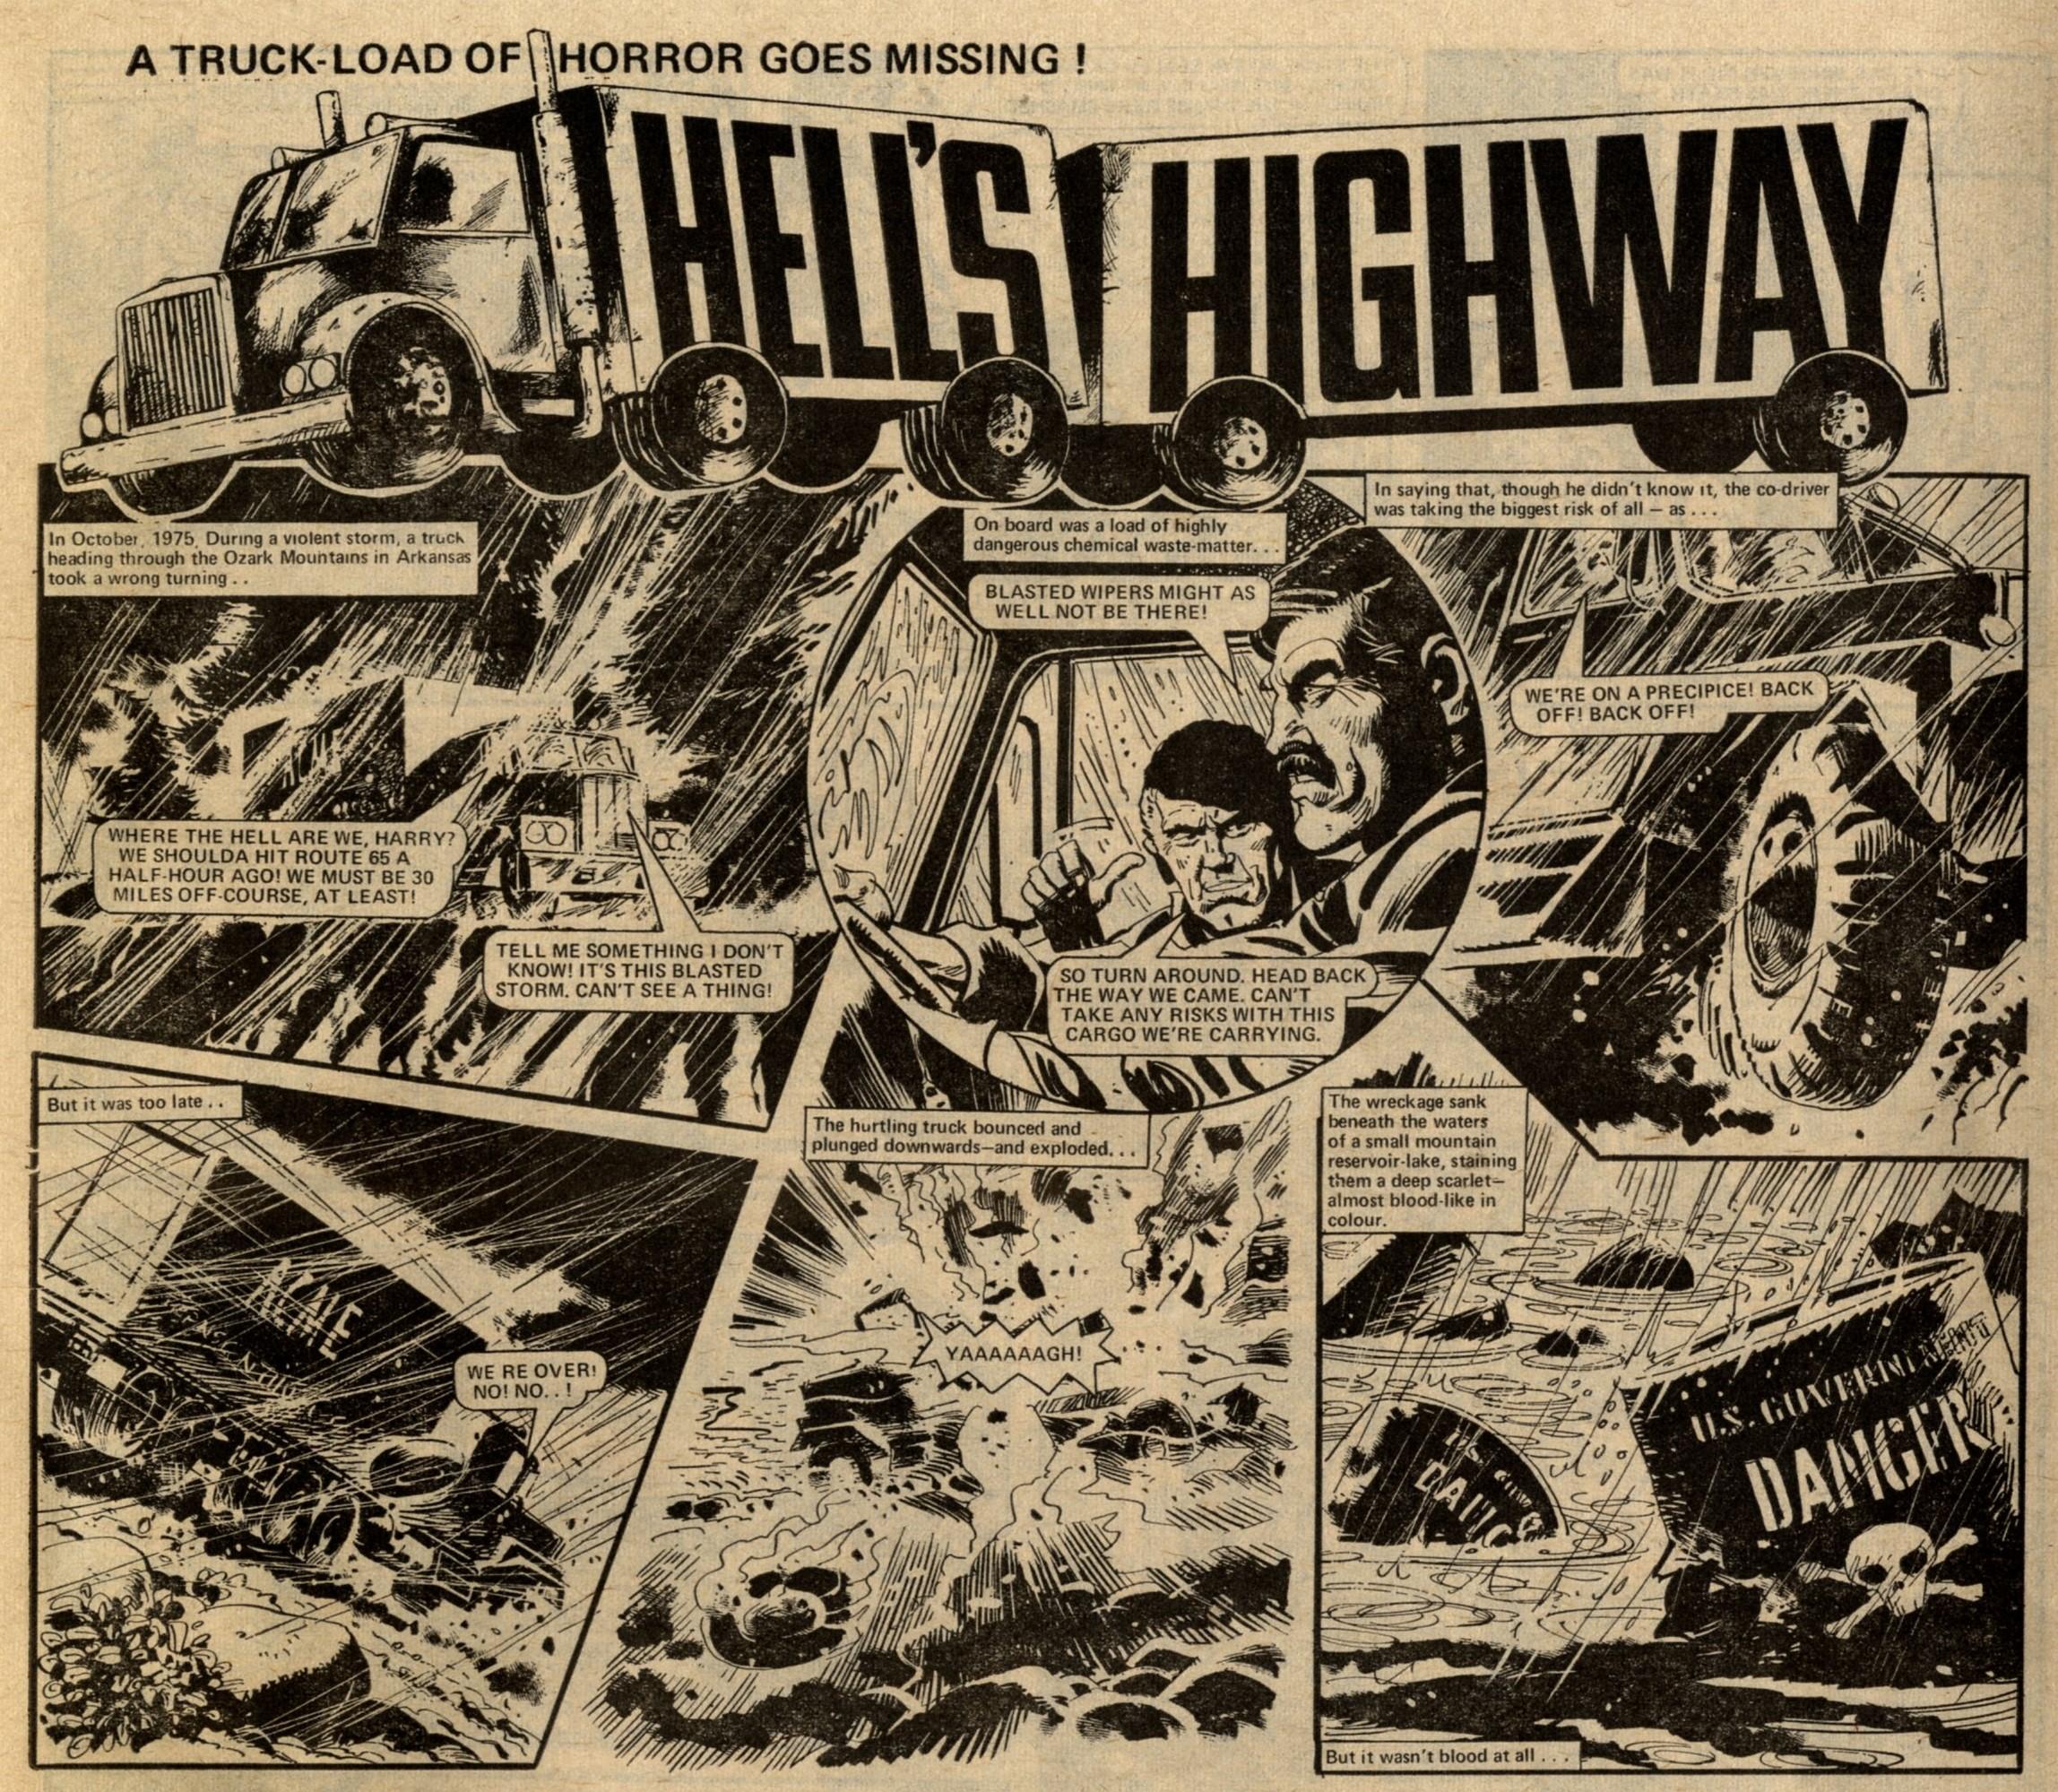 Hell's Highway: Chris Lowder (writer), Mike White (artist)